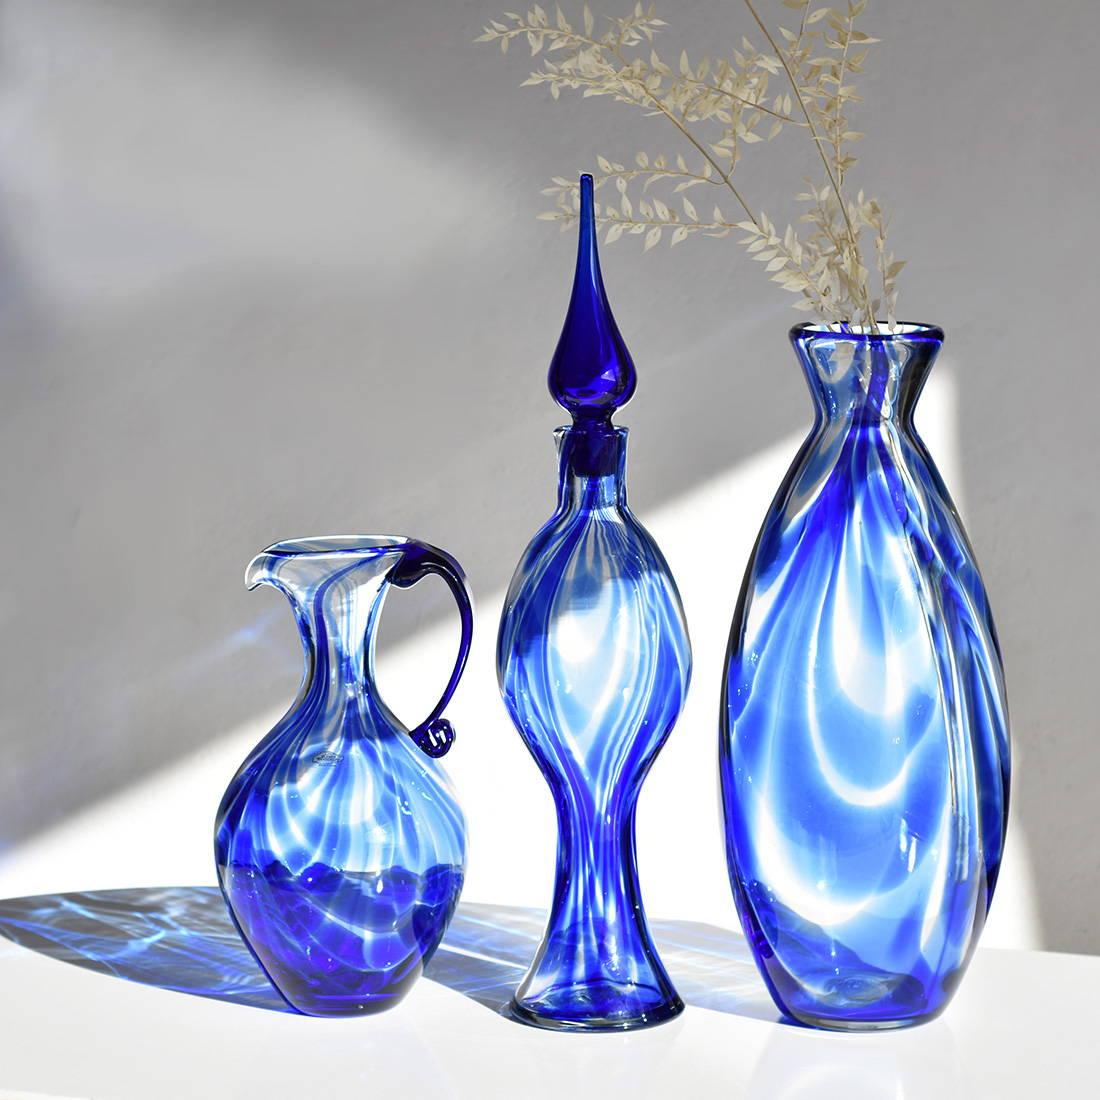 Blenko Glass Company | Functional Art Glass